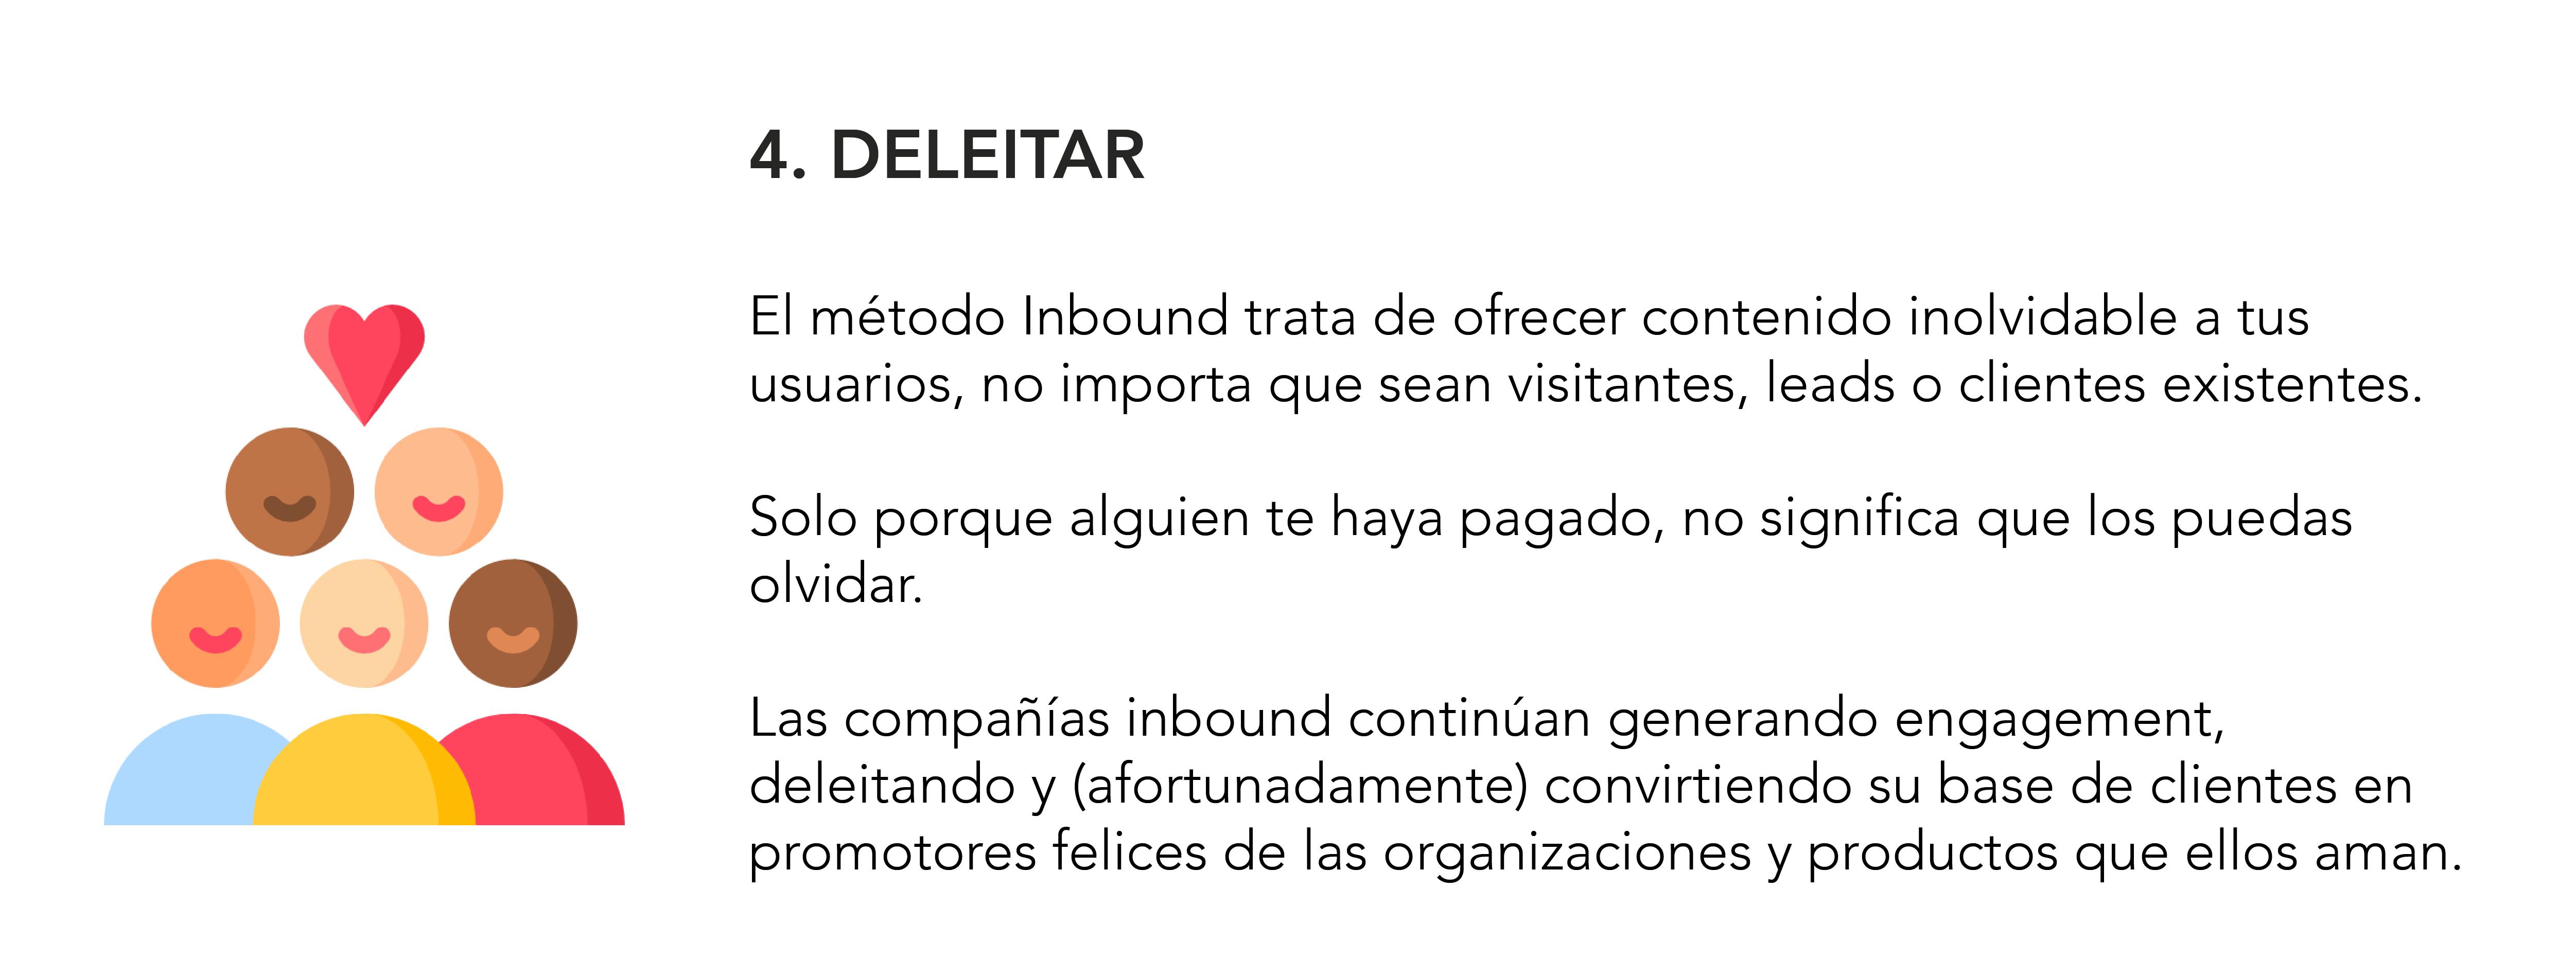 deleitar.png